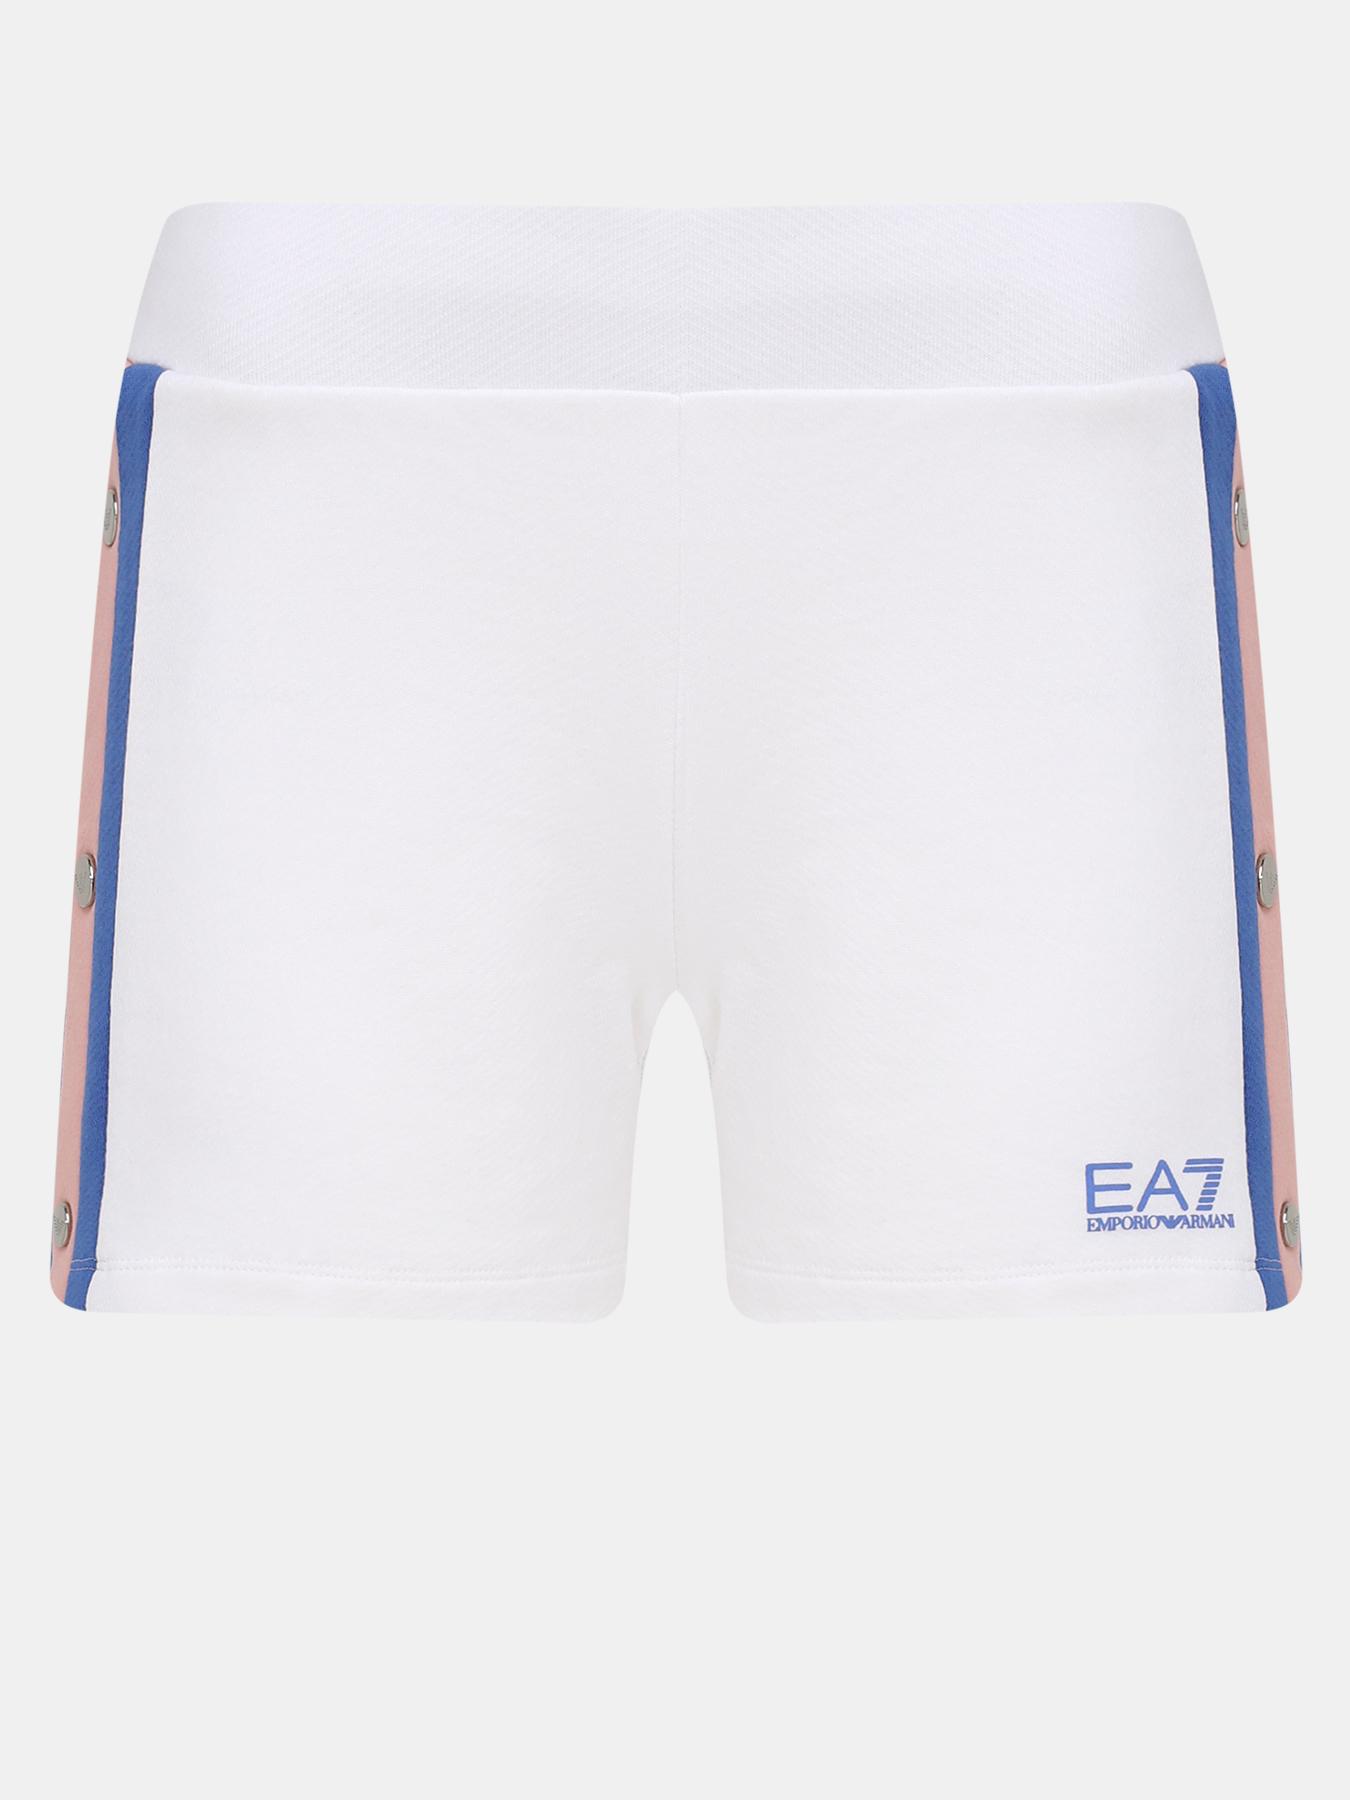 Фото - Шорты EA7 Emporio Armani Спортивные шорты спортивные шорты dc shoes middlegate white wbb0 s